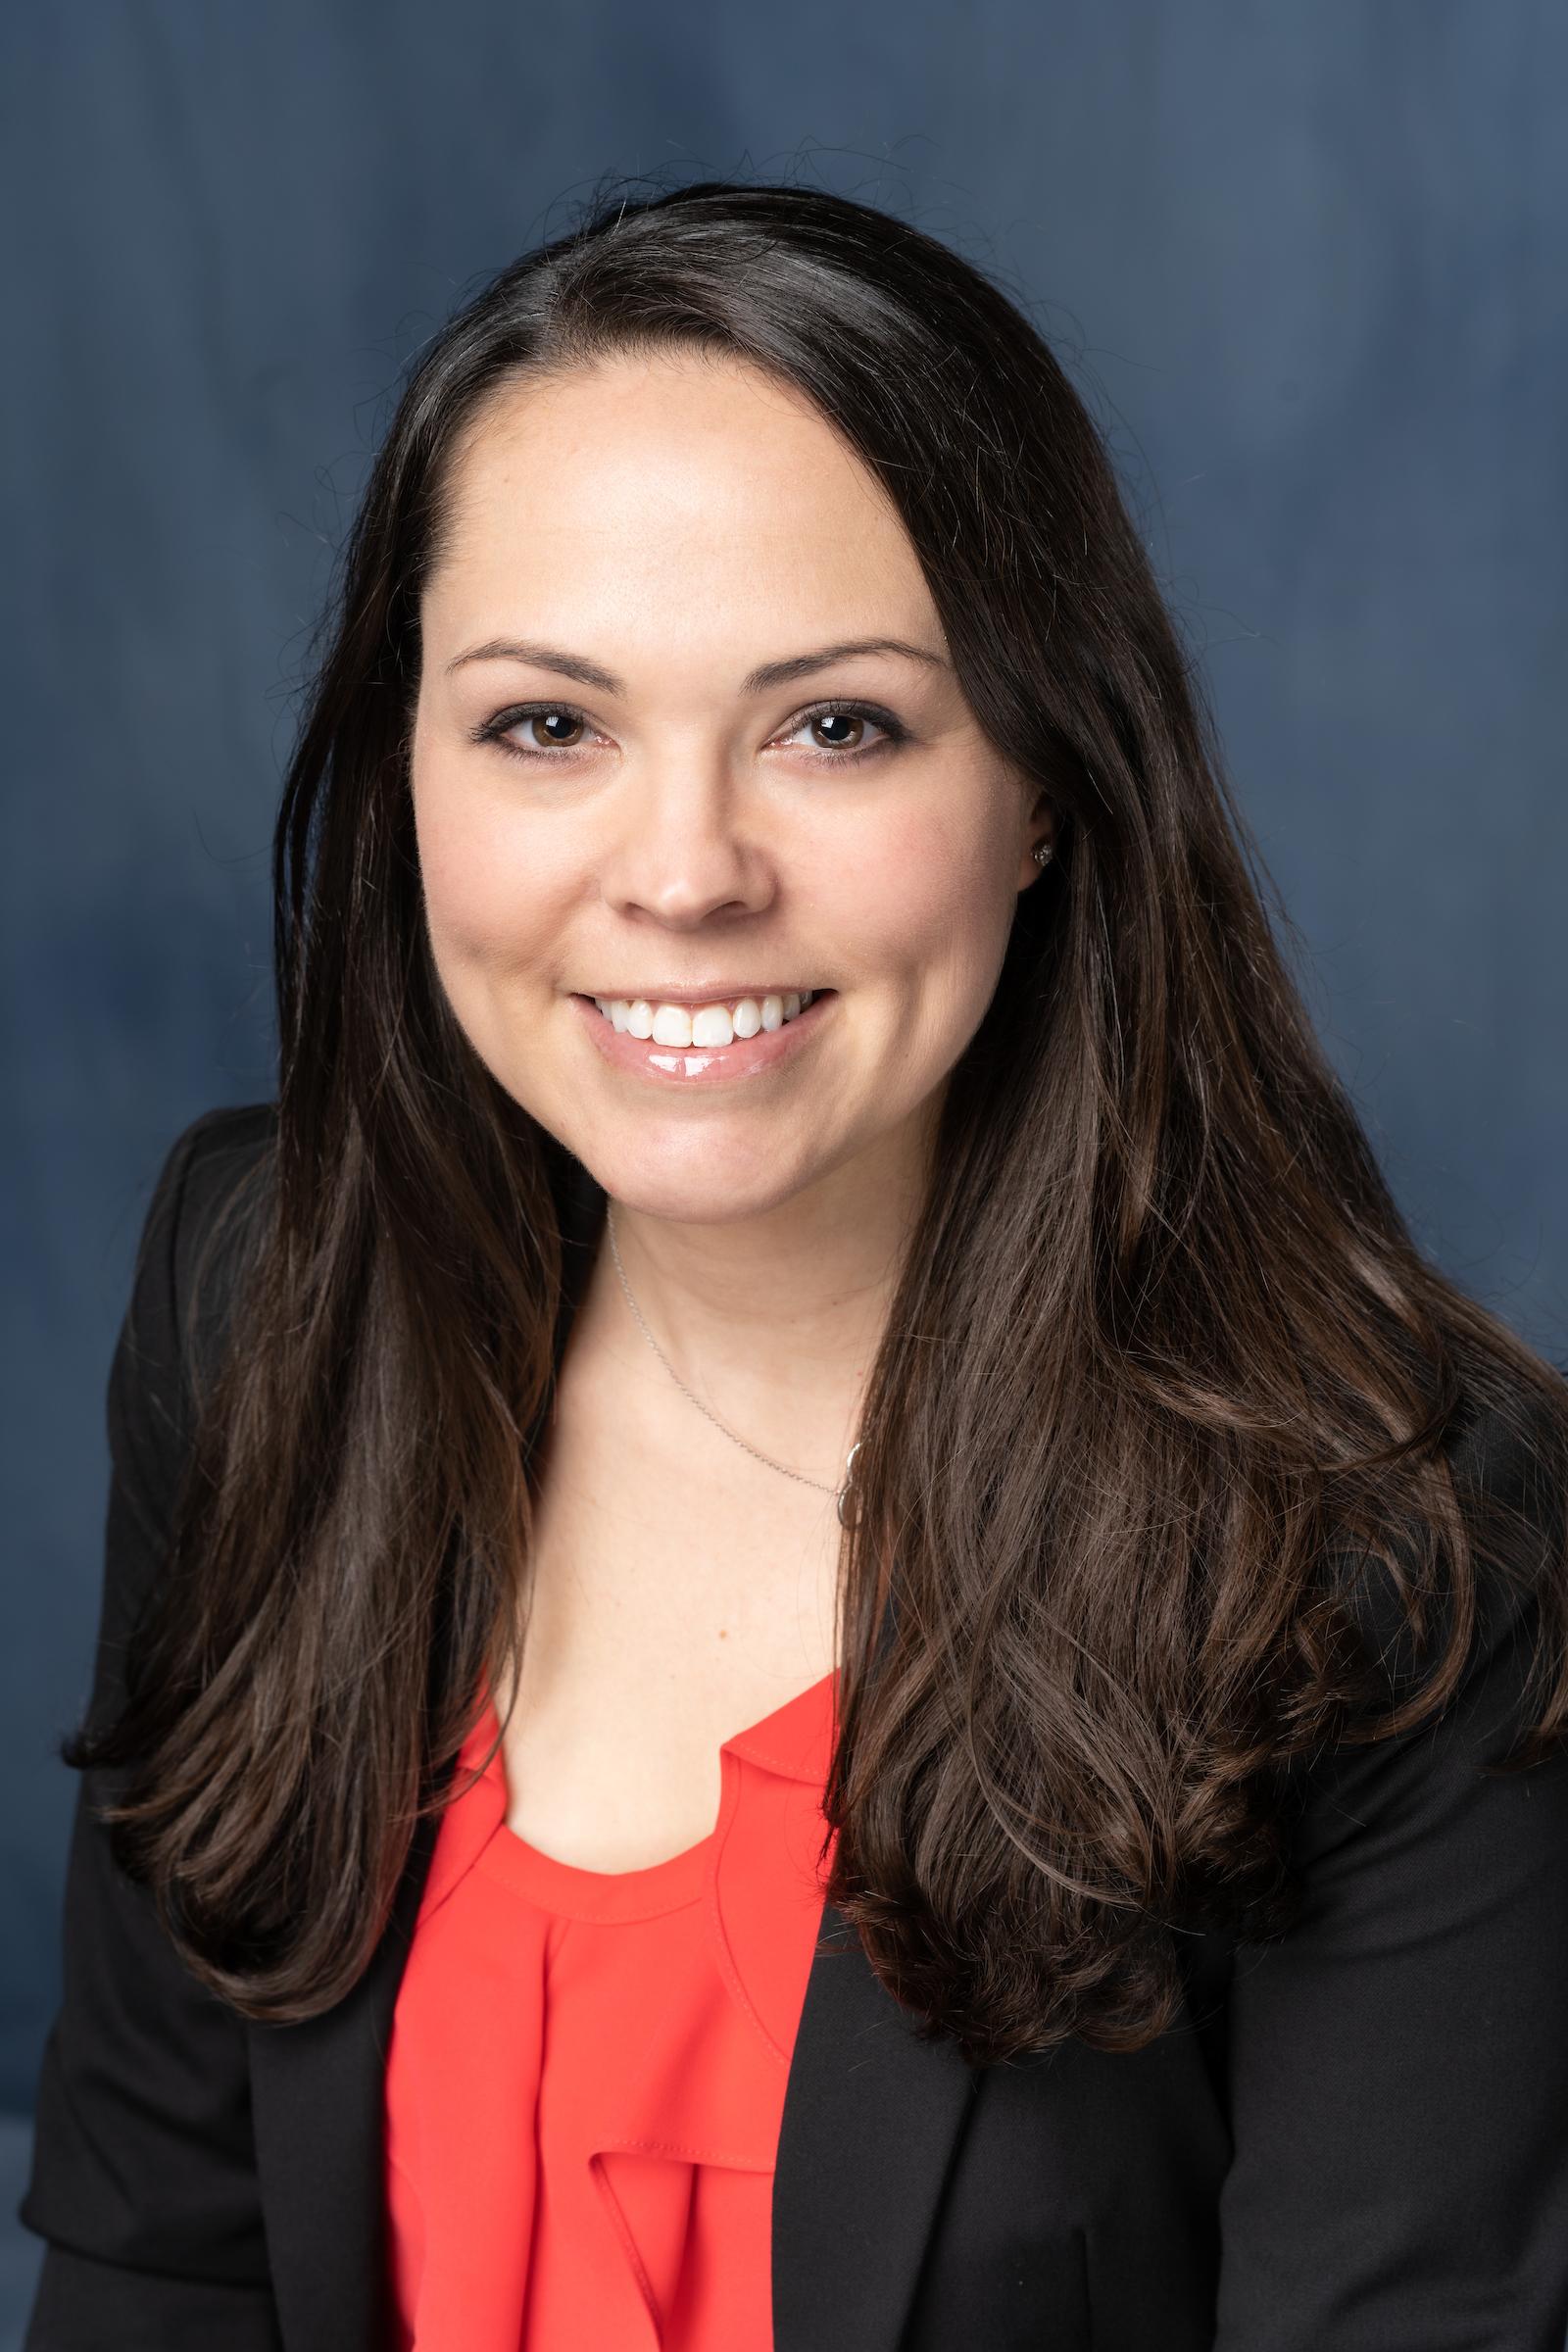 Kirsten Freeman